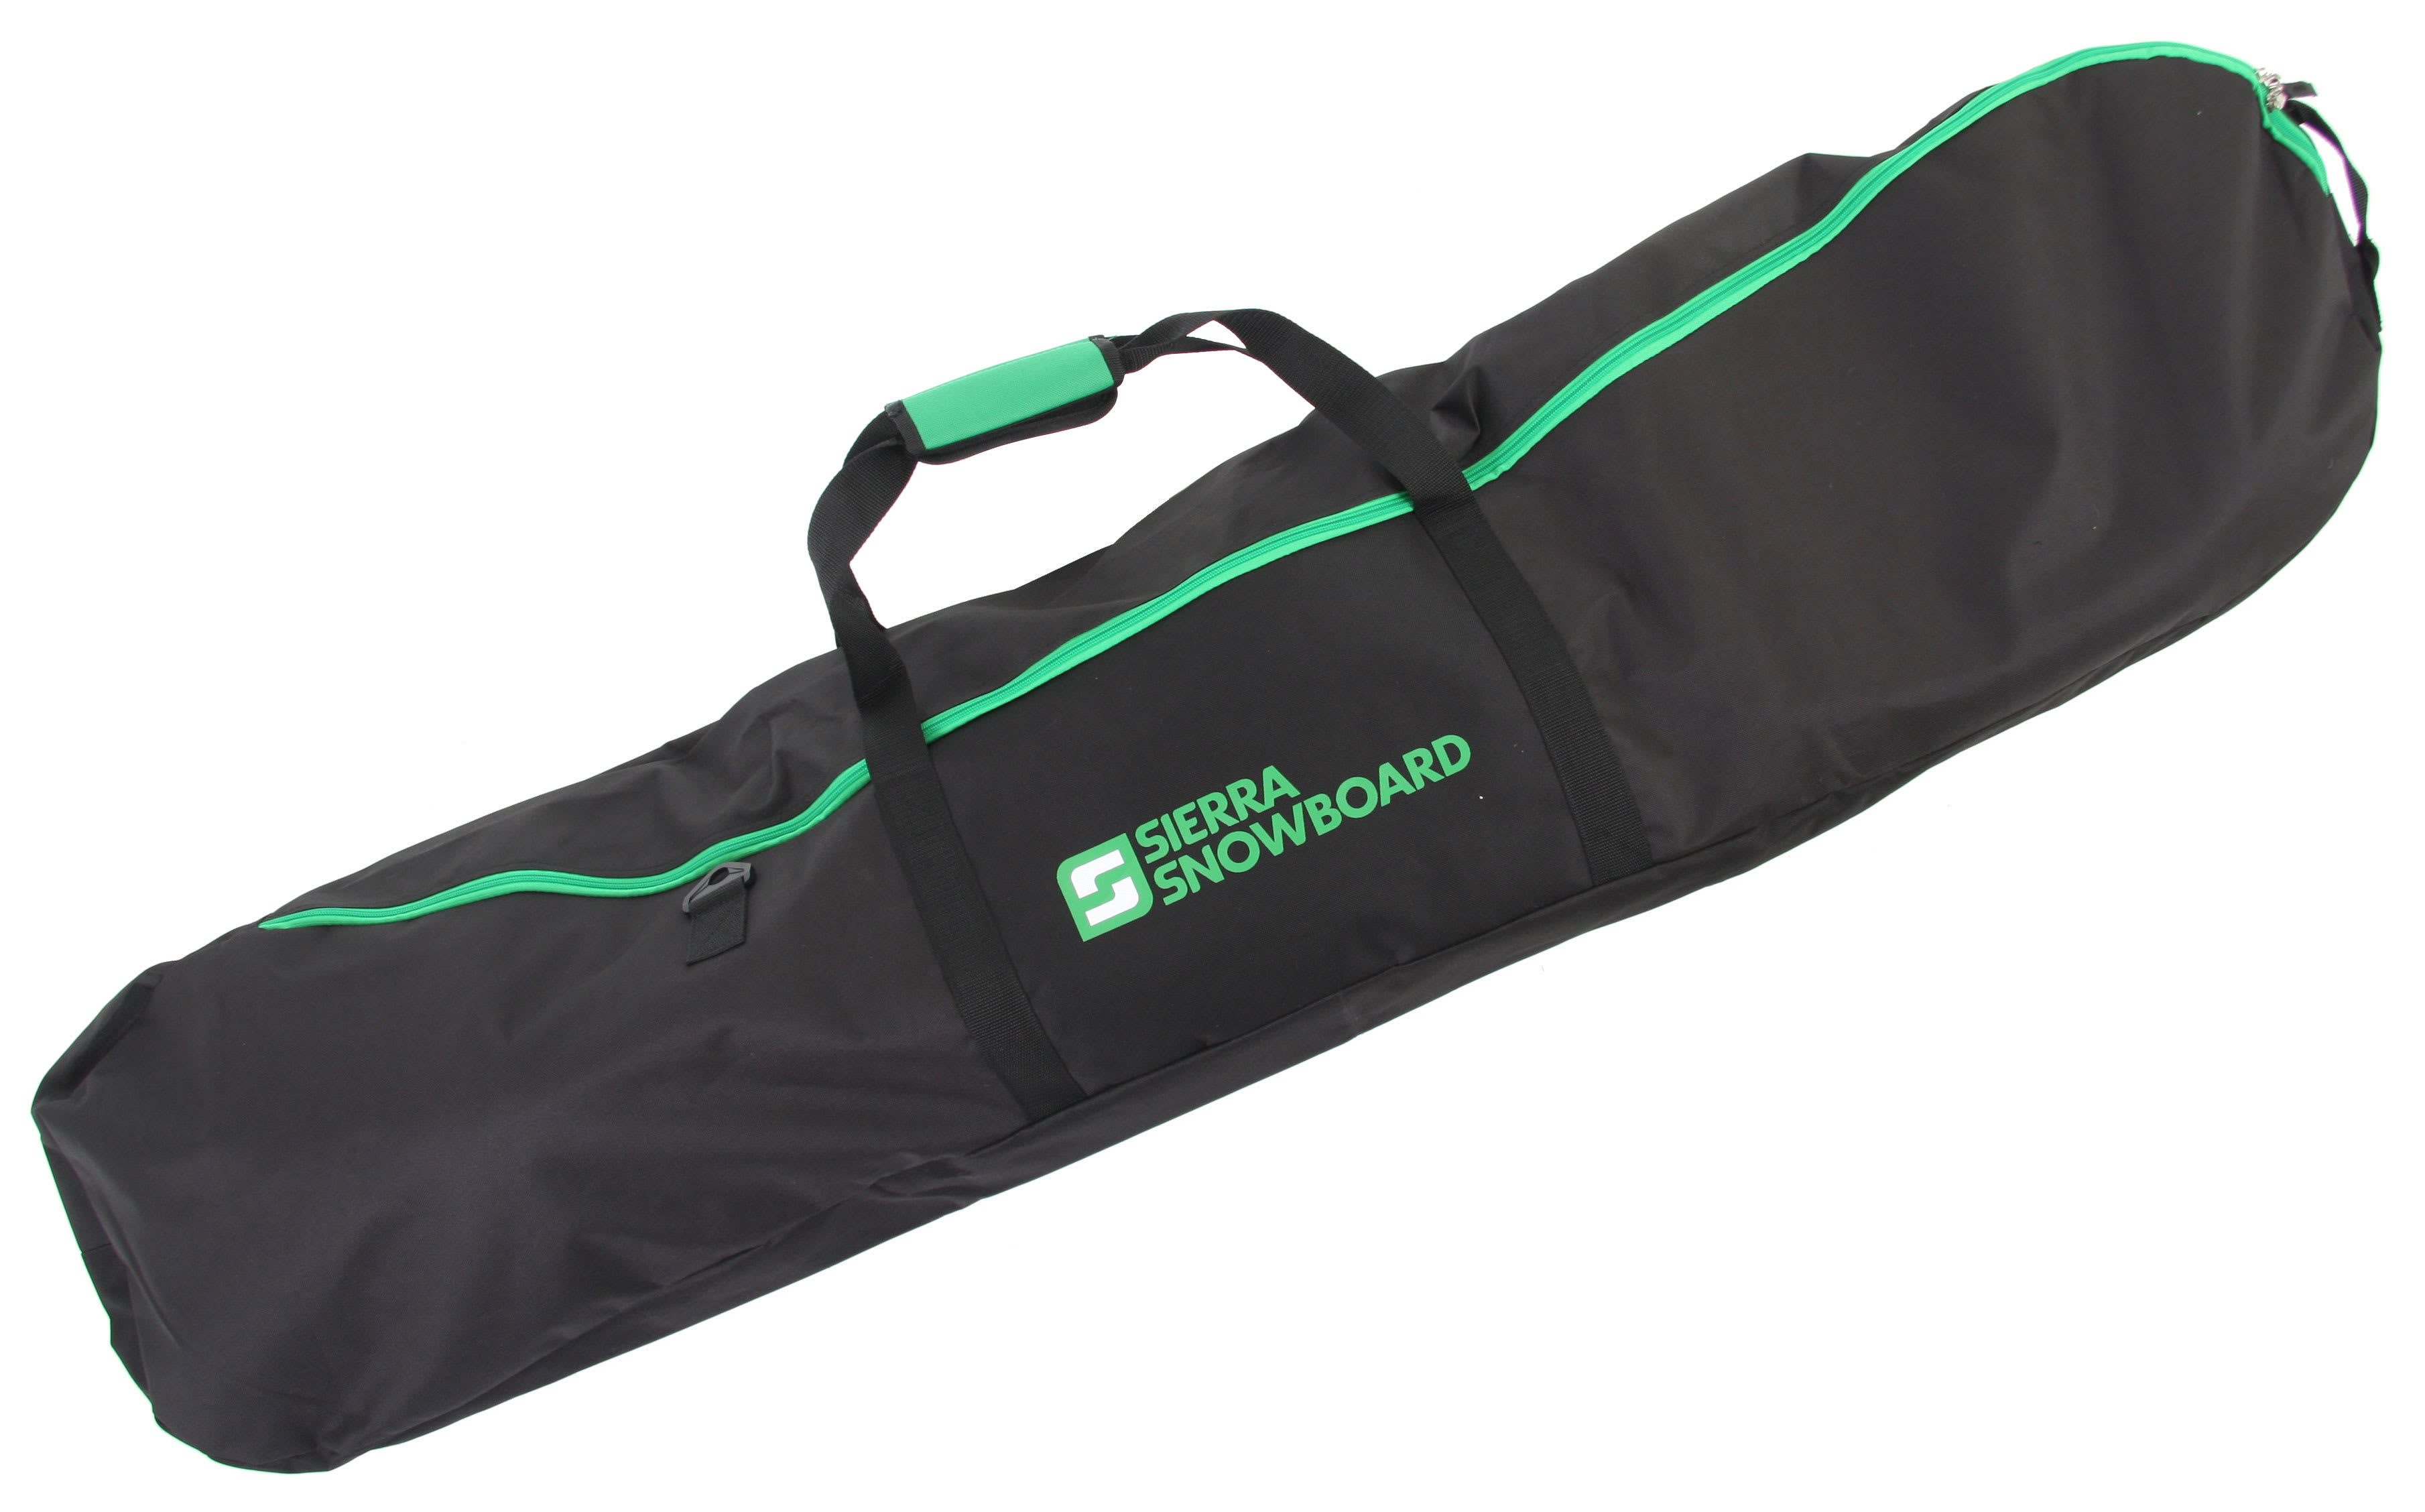 Sierra Logo Snowboard Bag Thumbnail 1